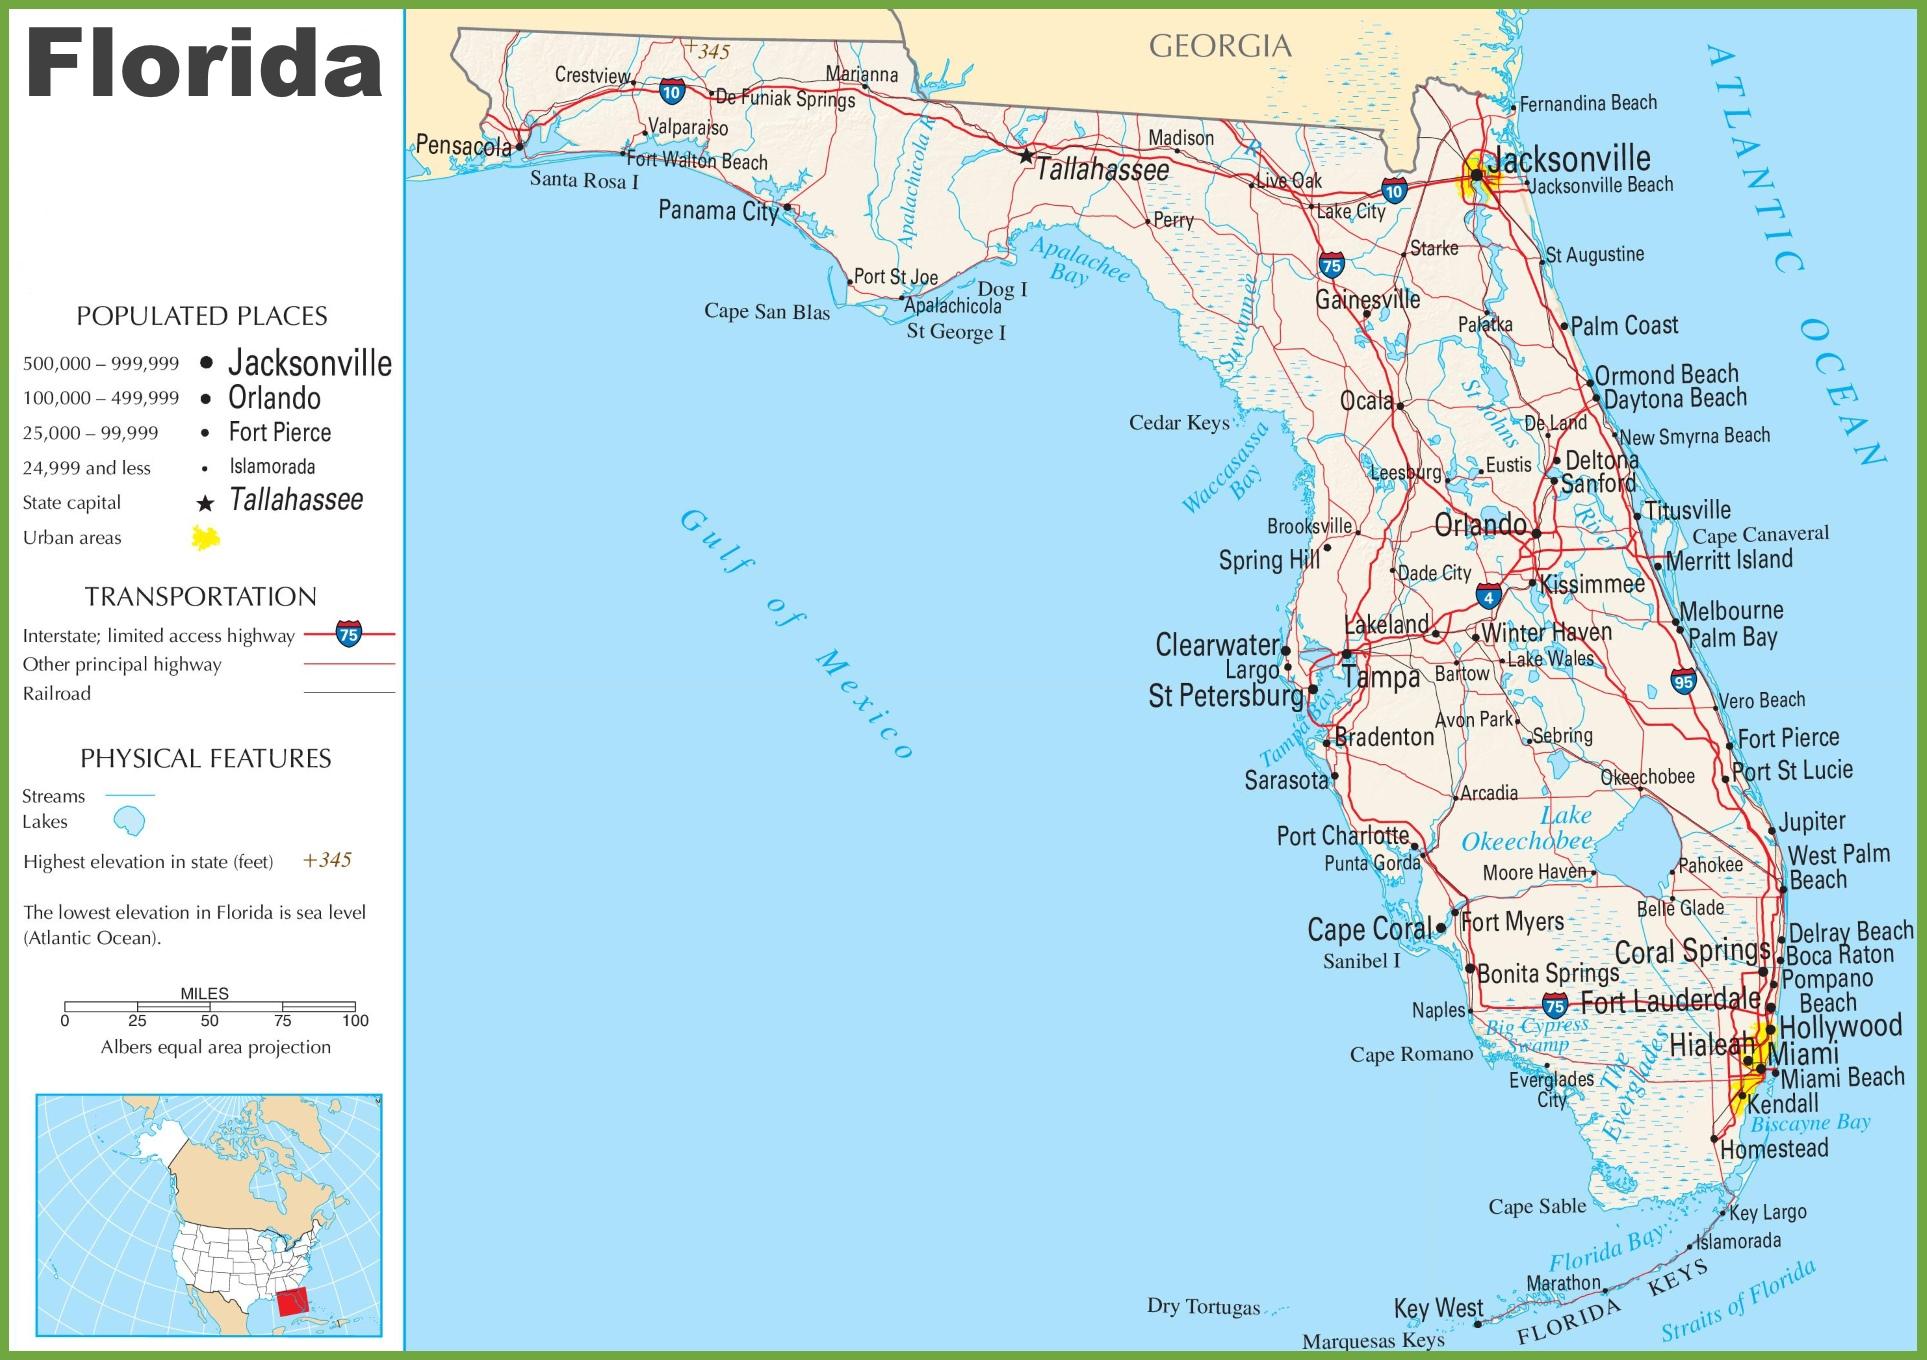 Florida Highway Map Florida highway map